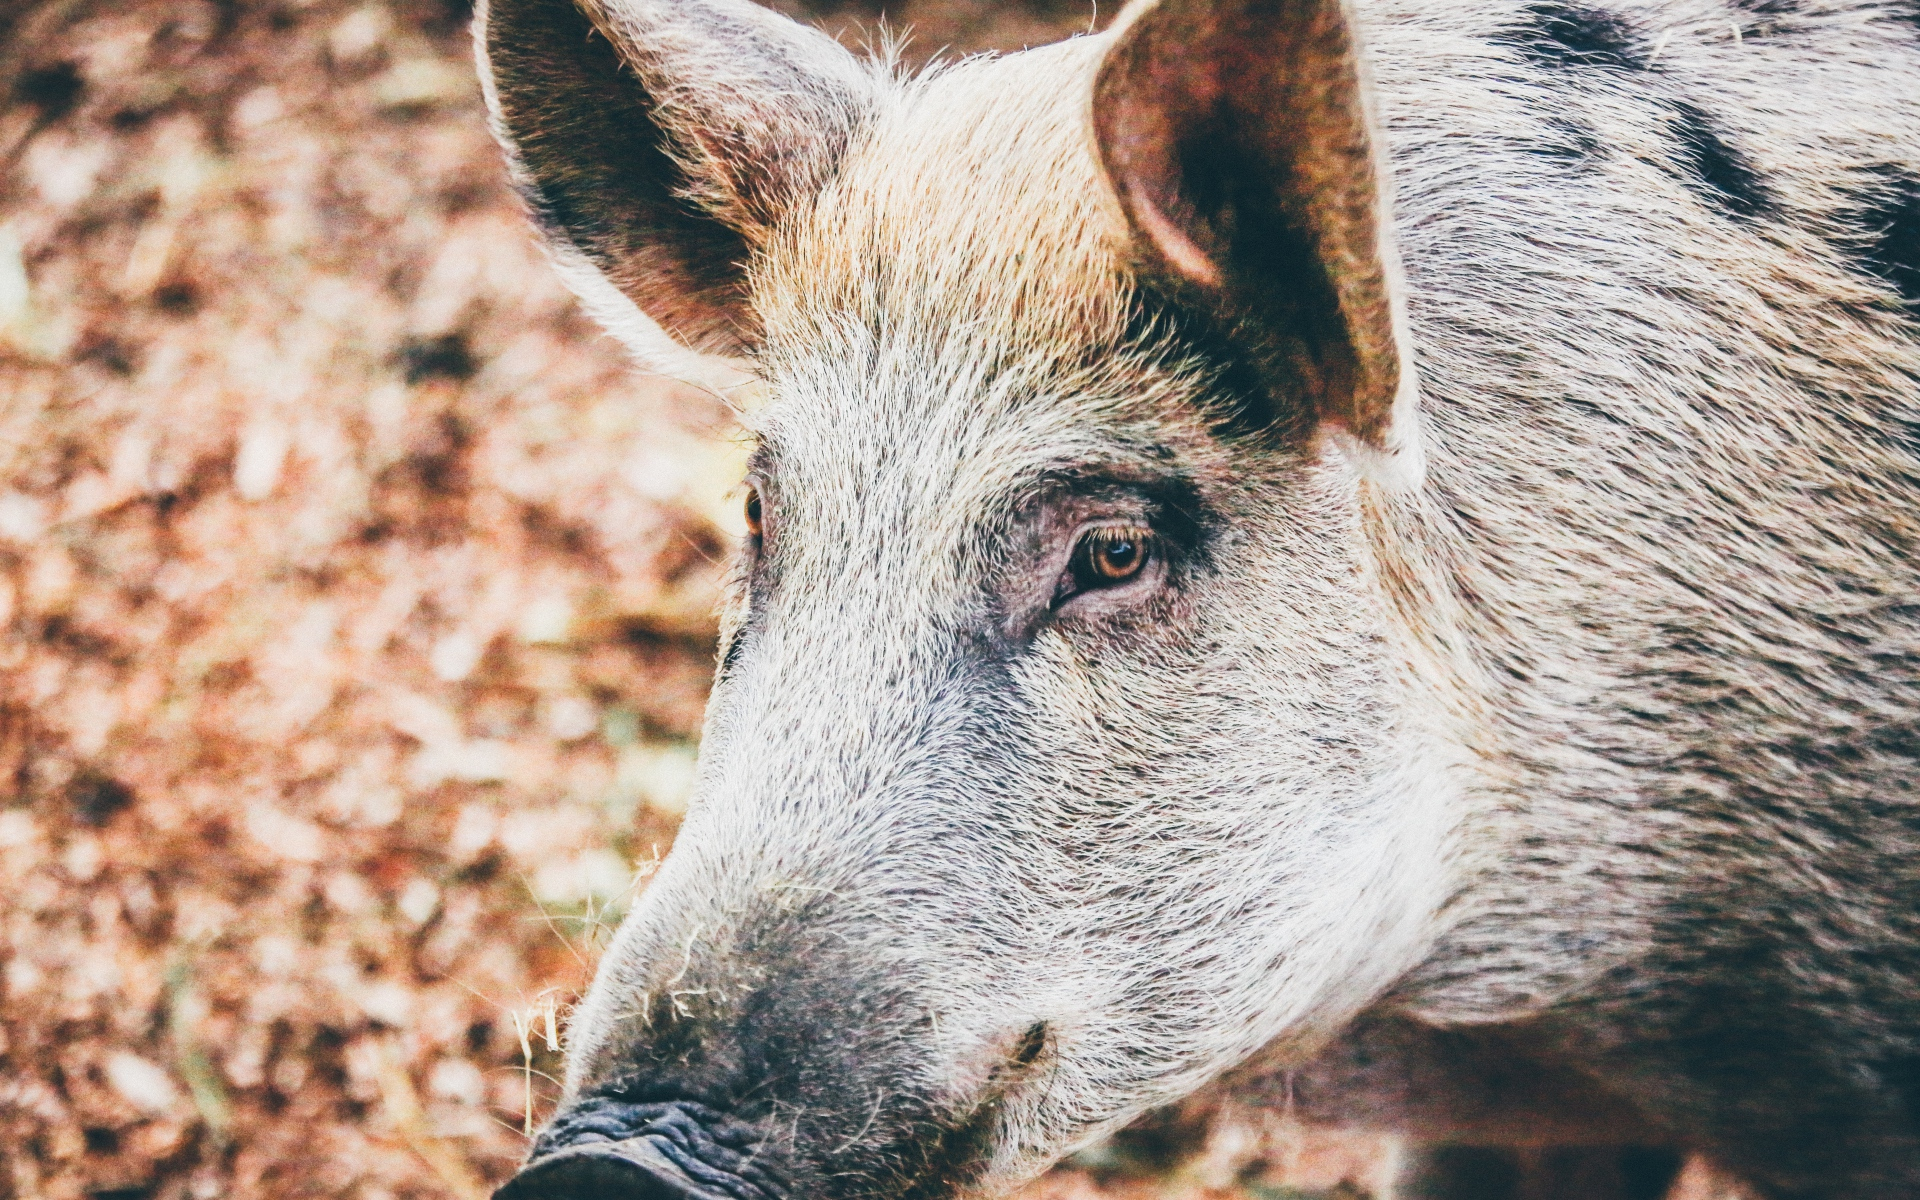 Картинки глаз свинки процедуры жару